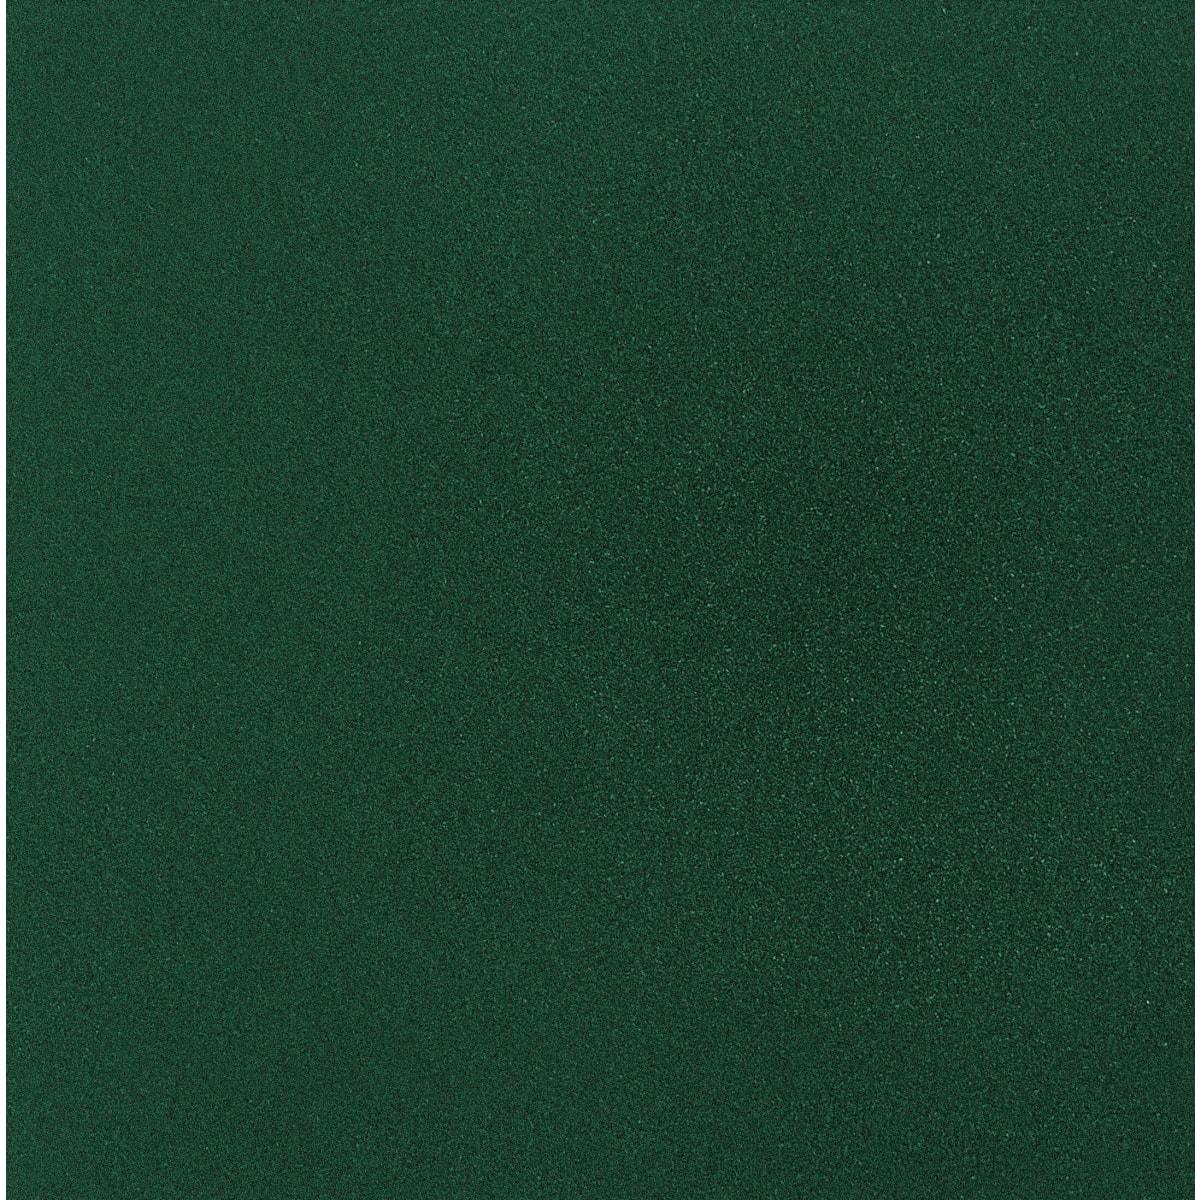 Плитка резиновая 500х500х30 пуансон цвет зеленый